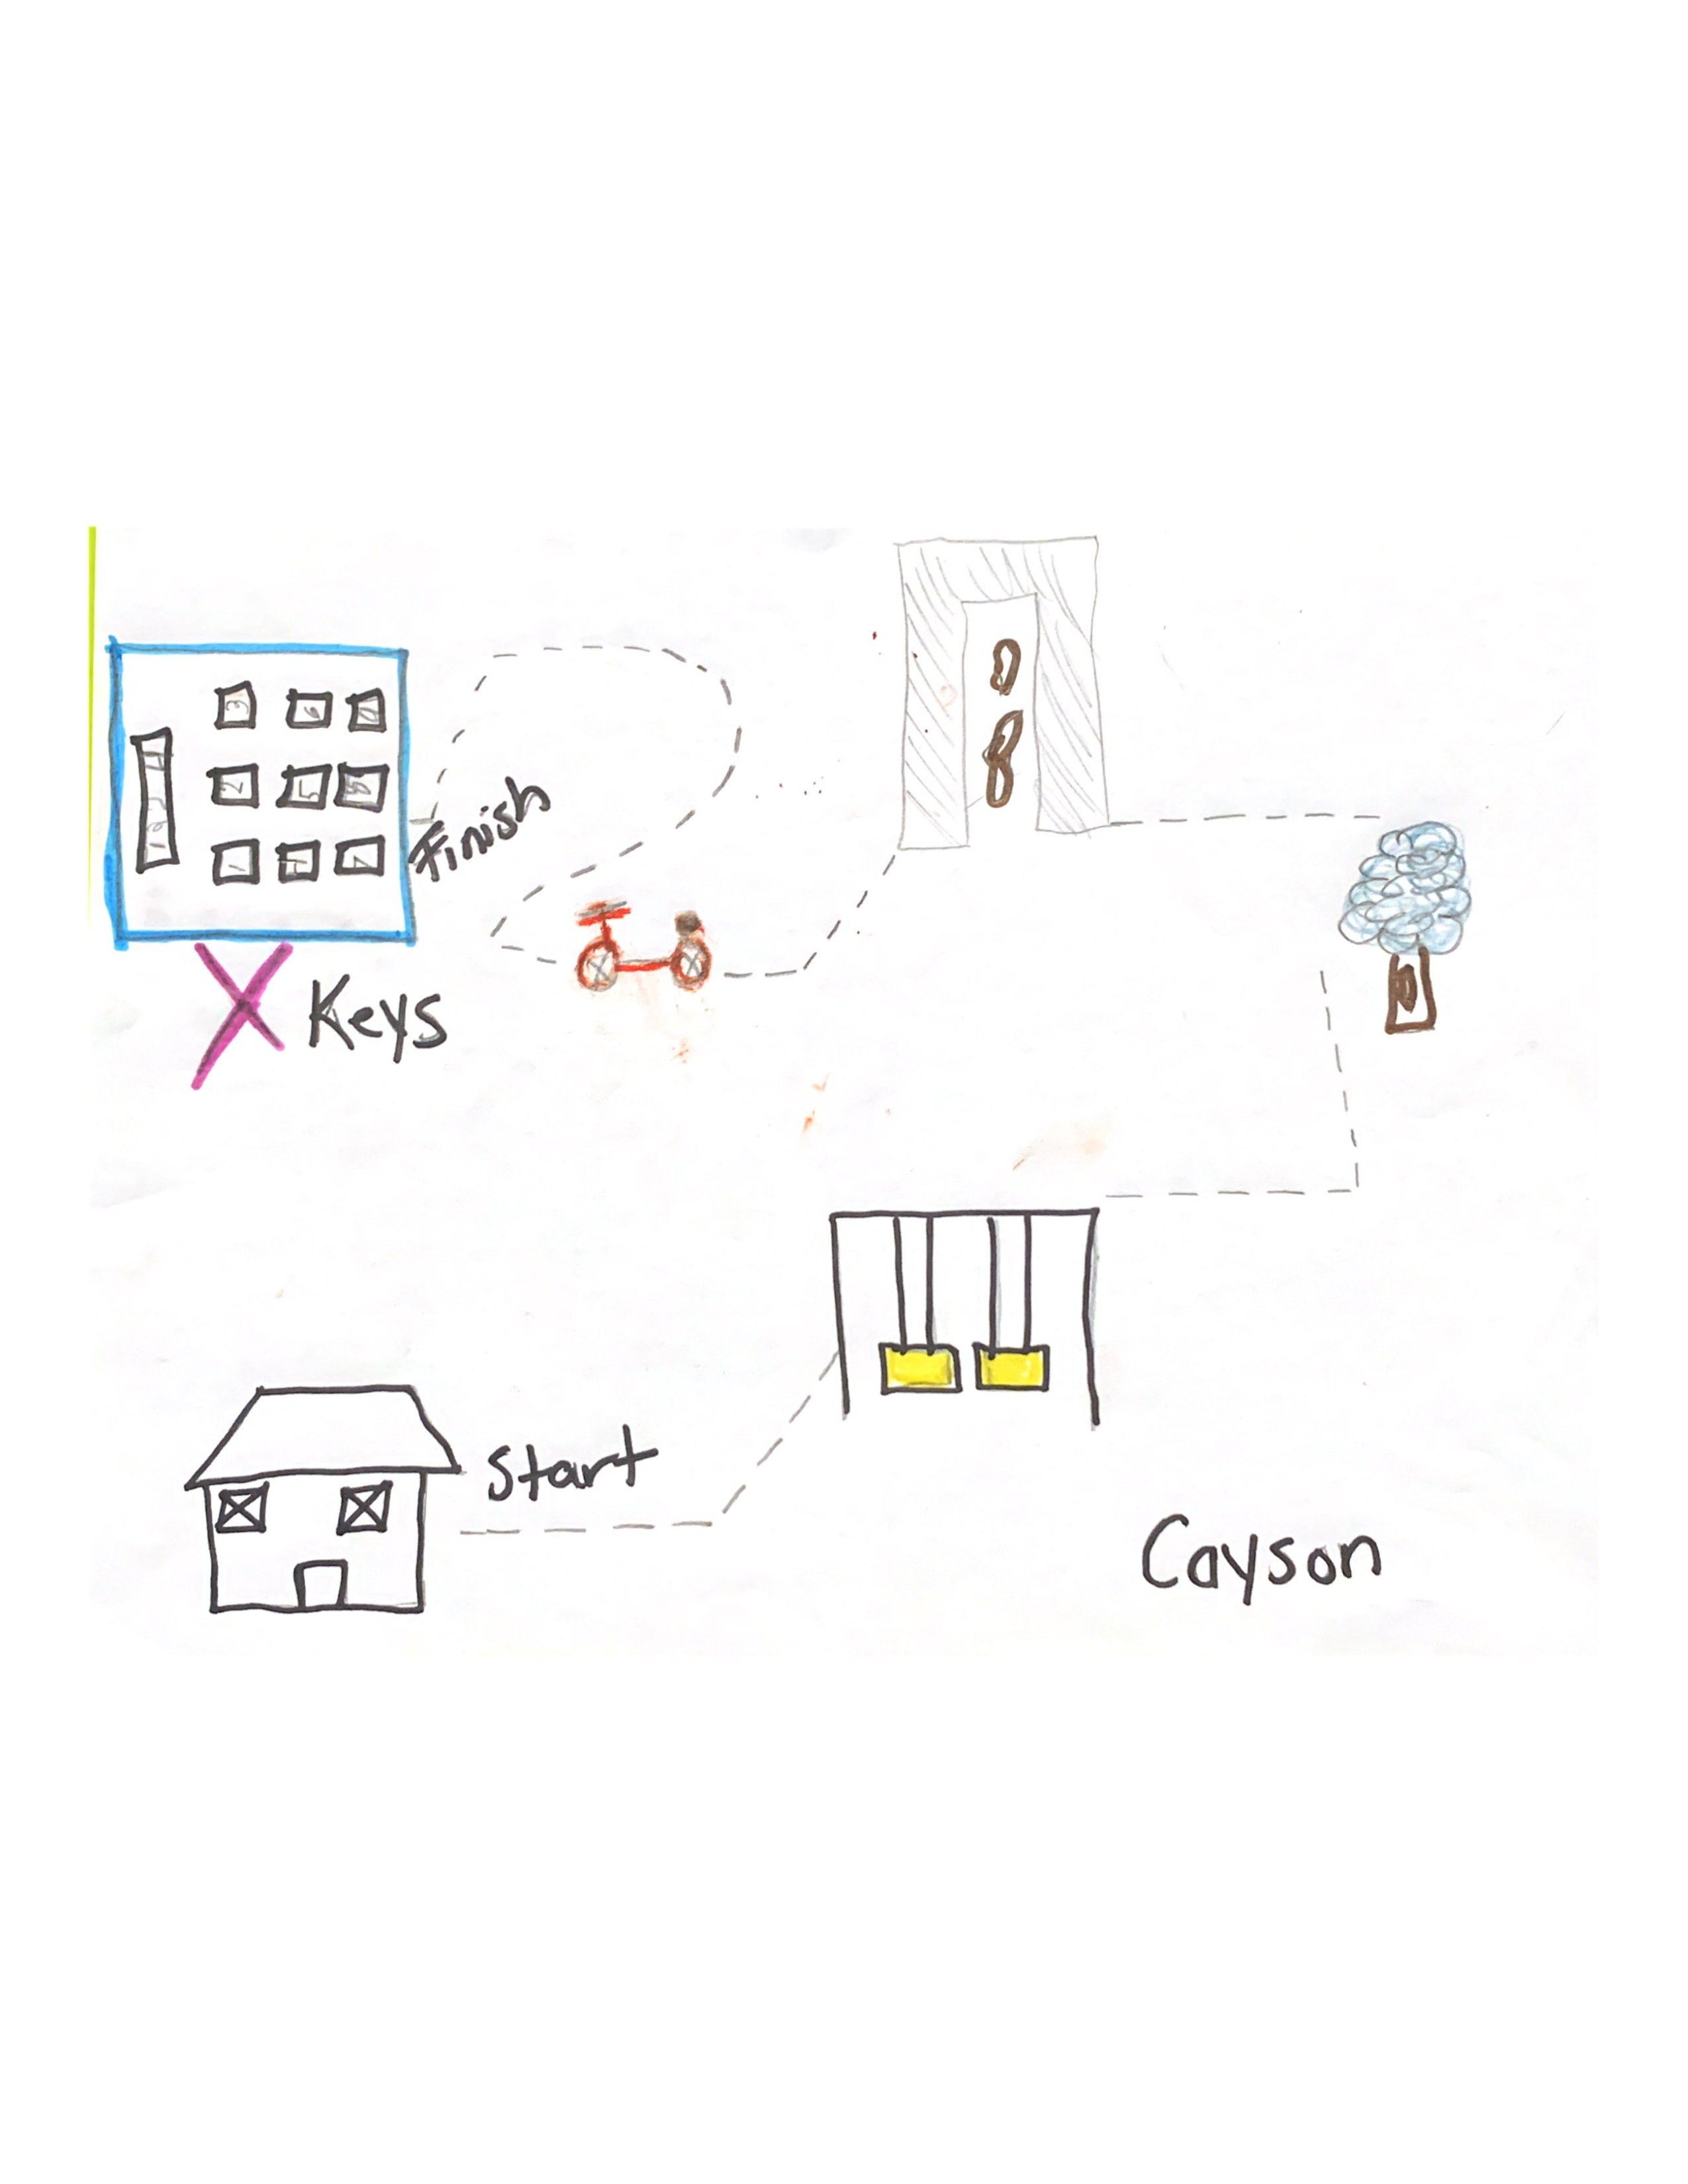 Cayson